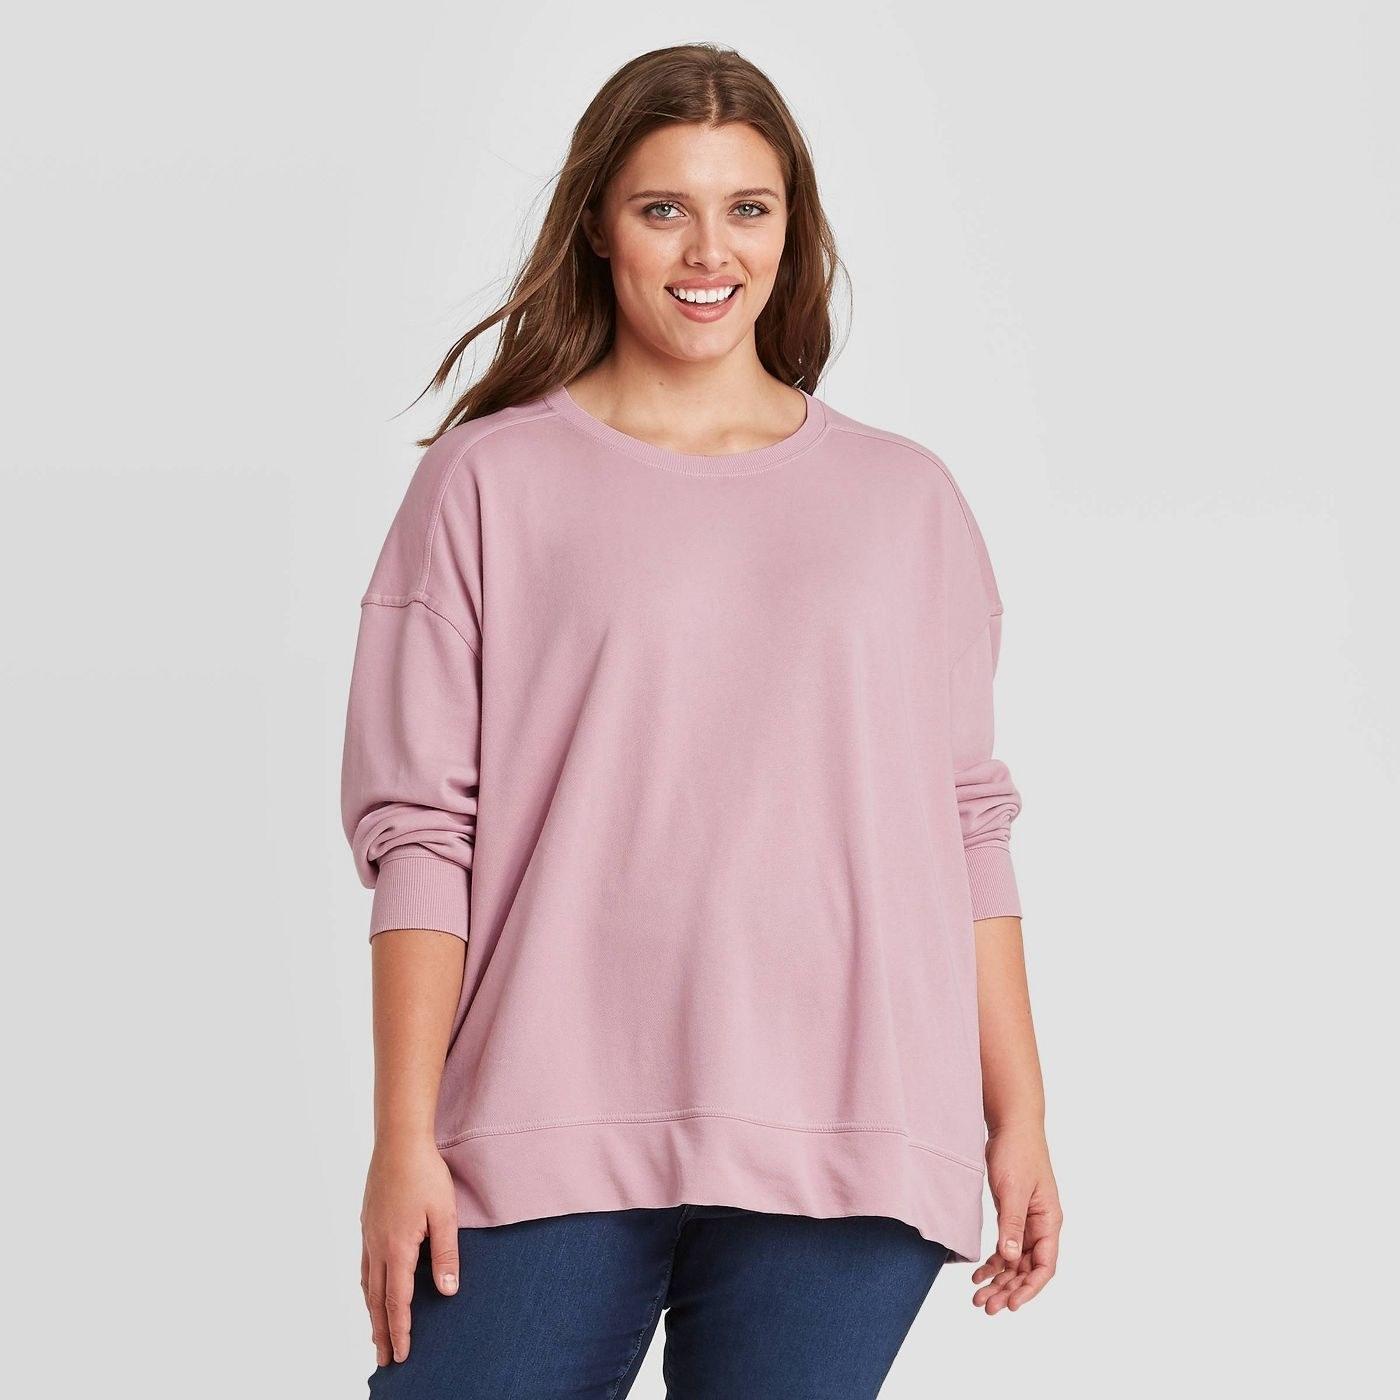 Model wearing the pink sweatshirt